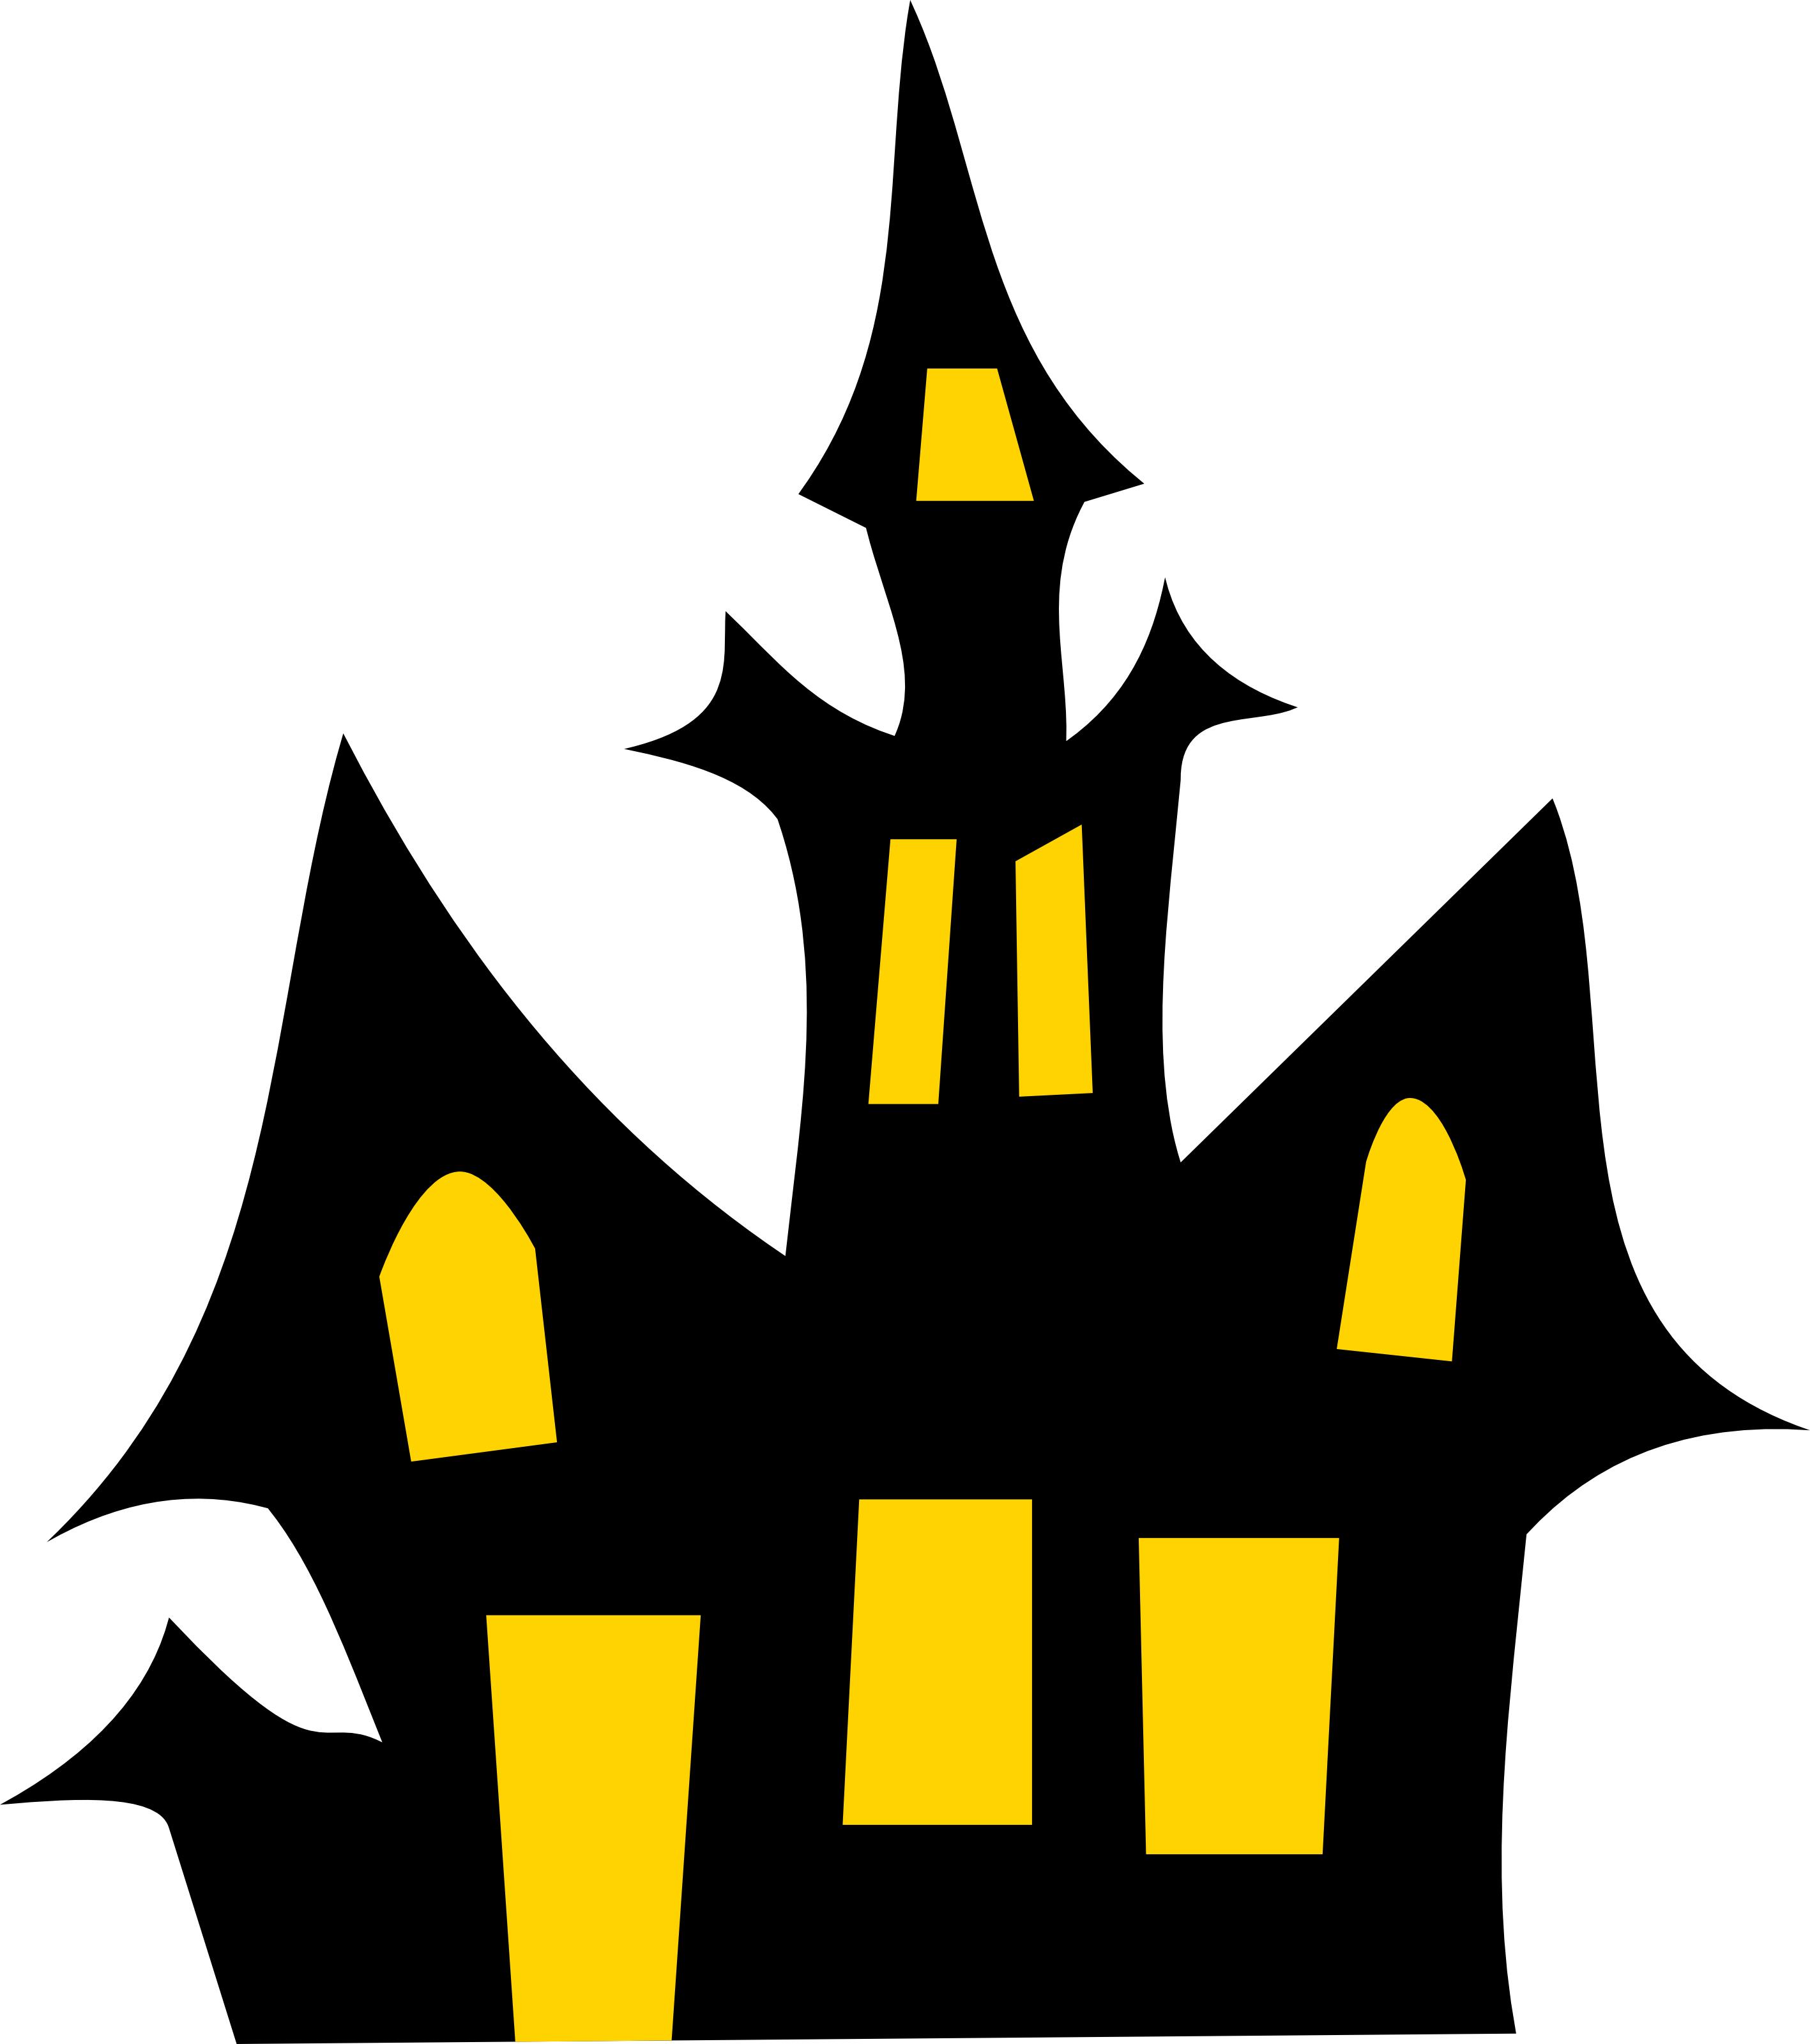 Haunted House Clipart .-Haunted House Clipart .-0